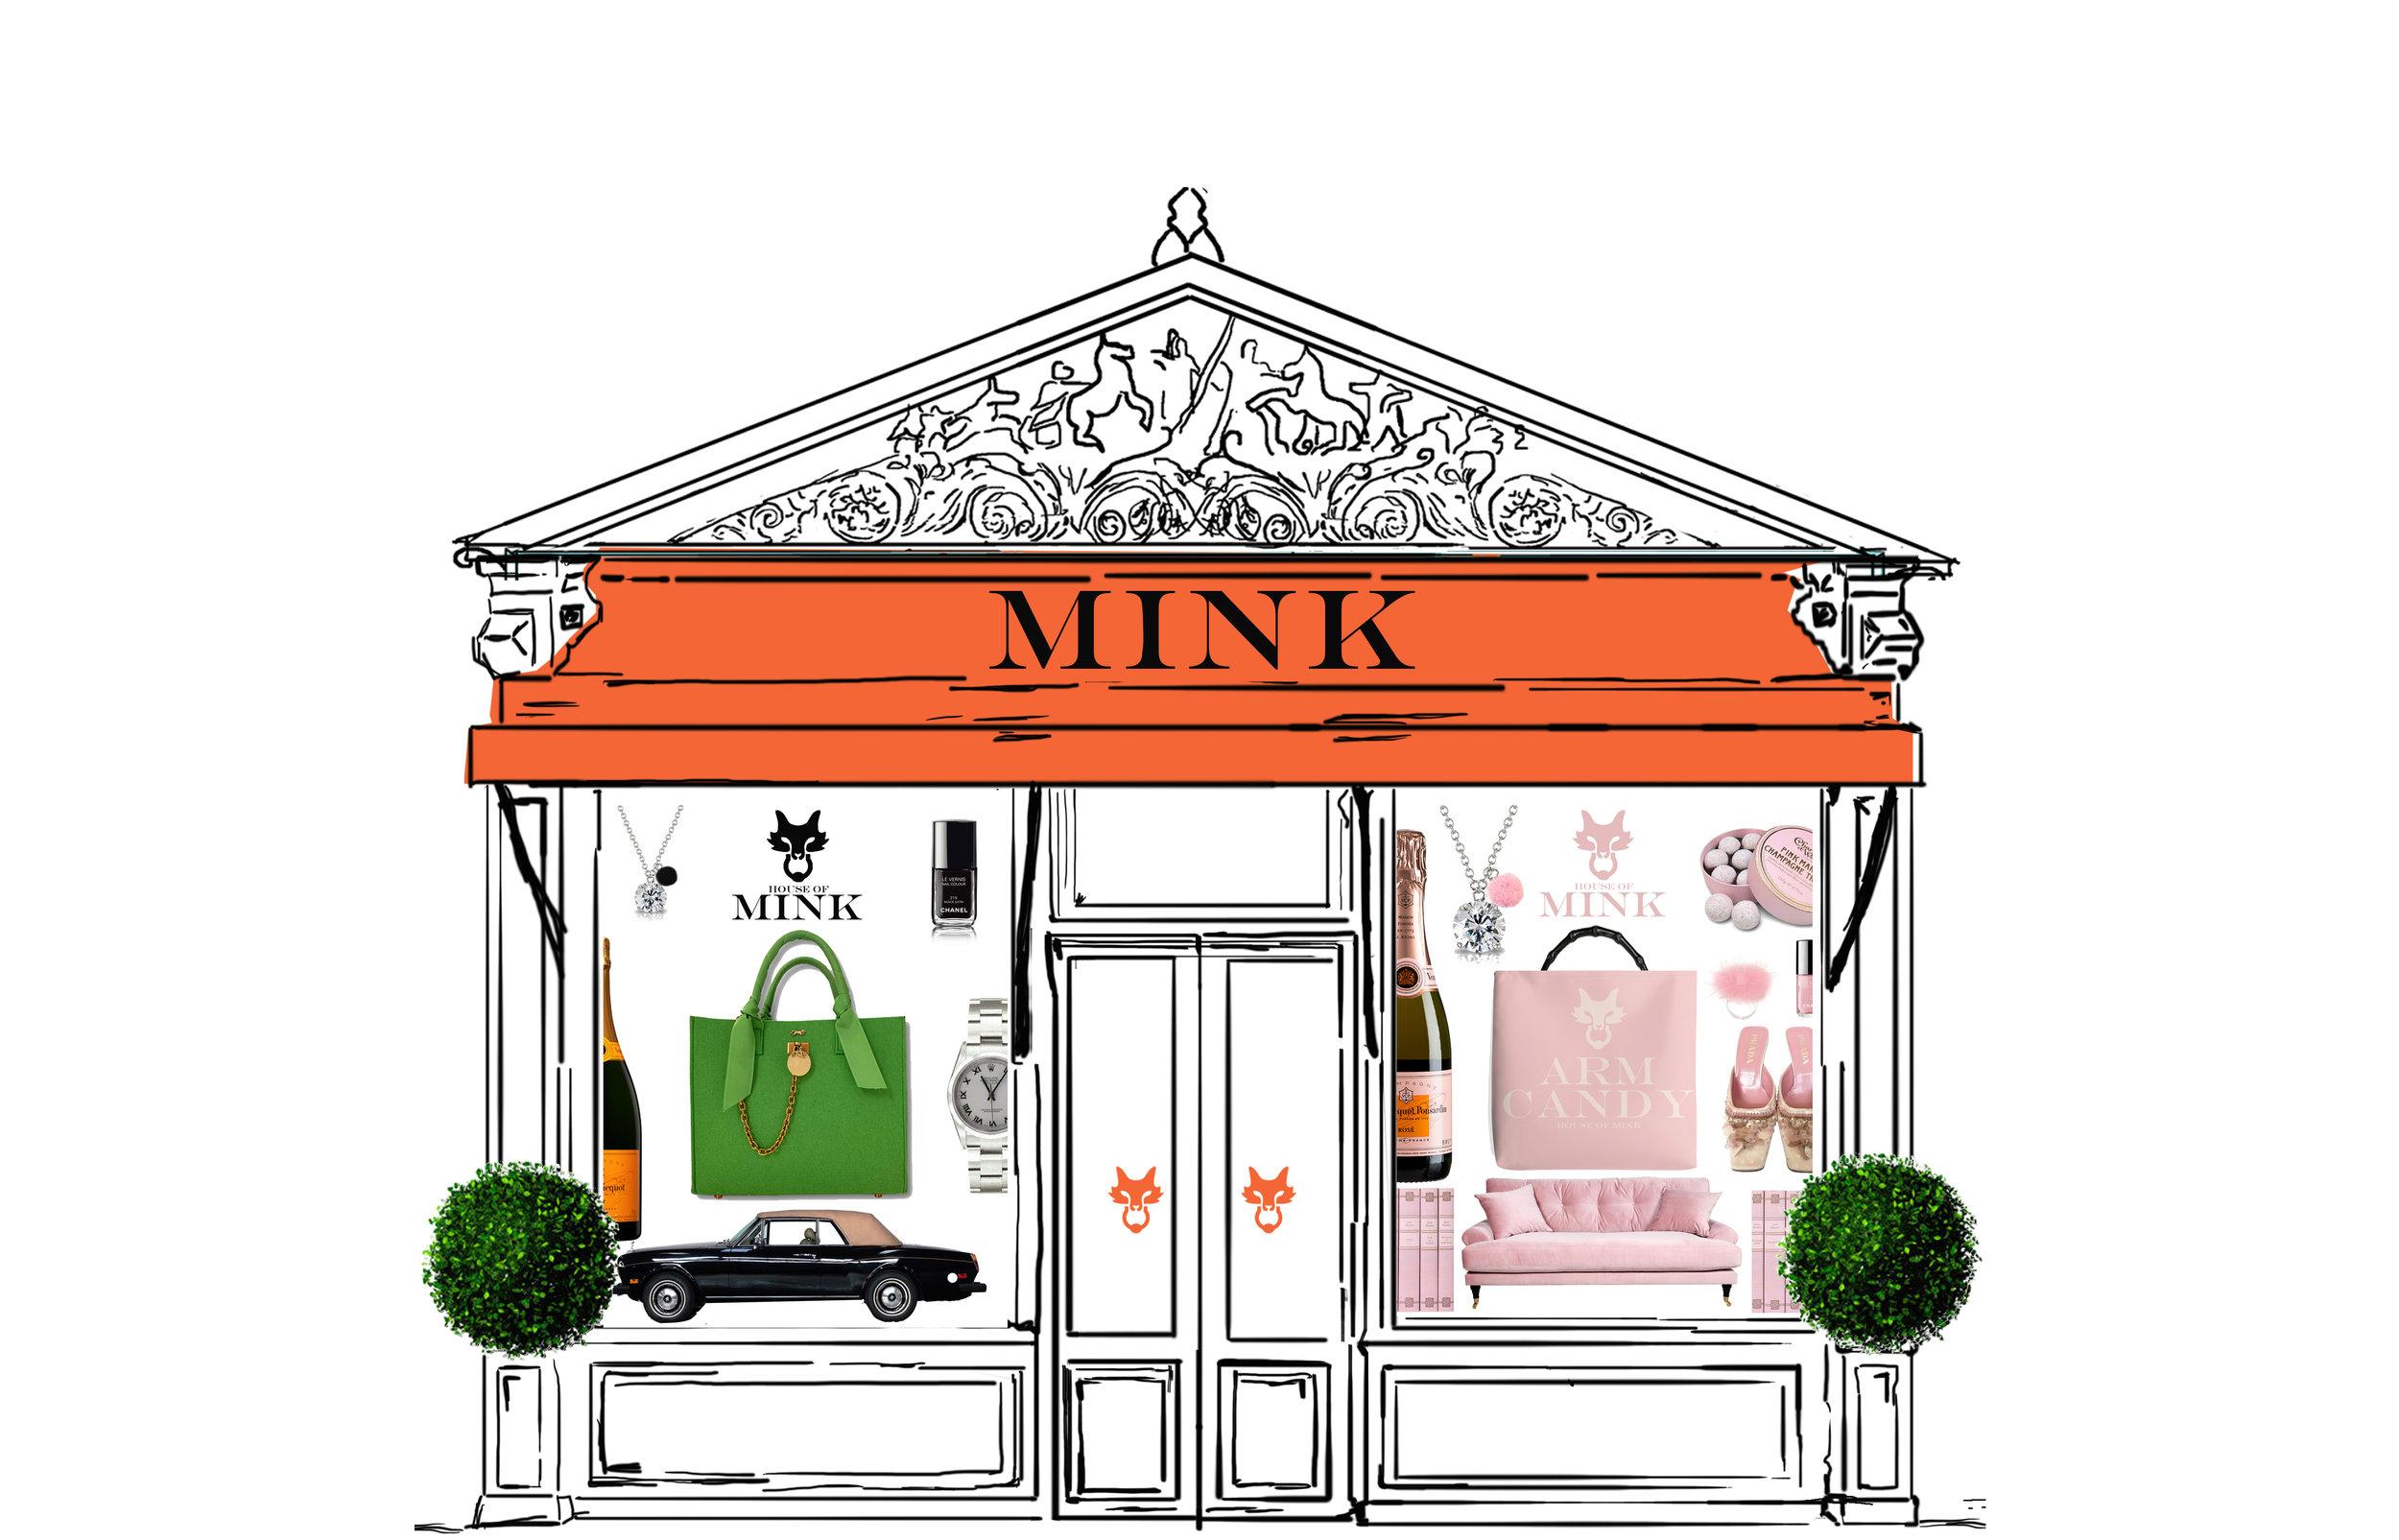 mink_housebuilding12_SHOP4b.jpg